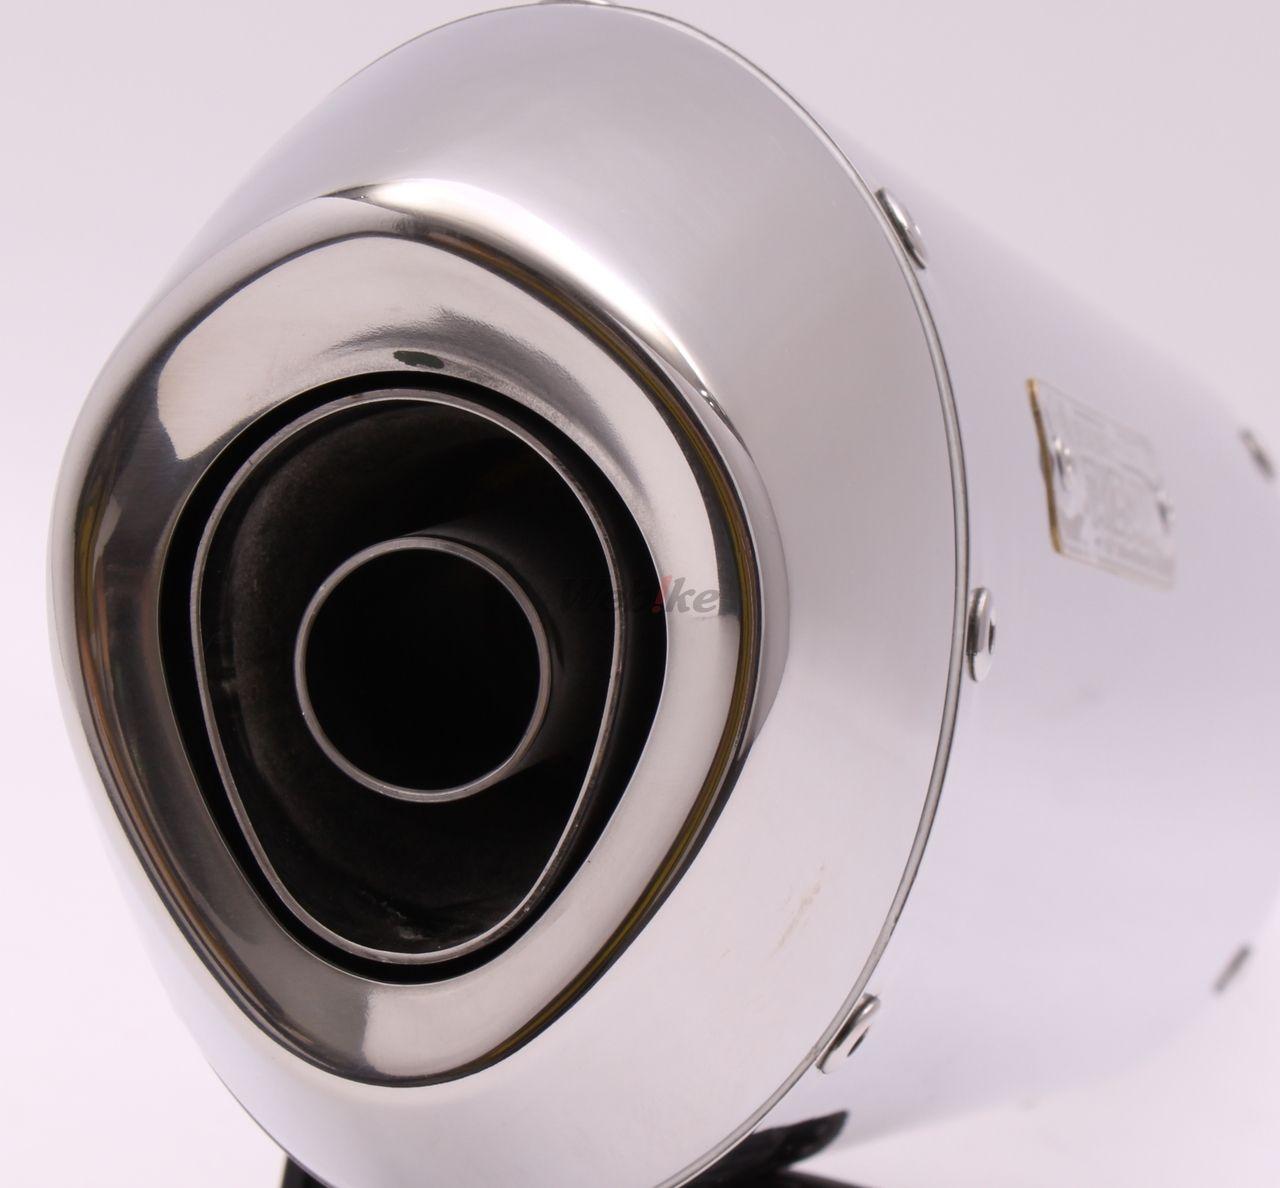 【SP武川】Cones Oval 排氣管尾段 - 「Webike-摩托百貨」